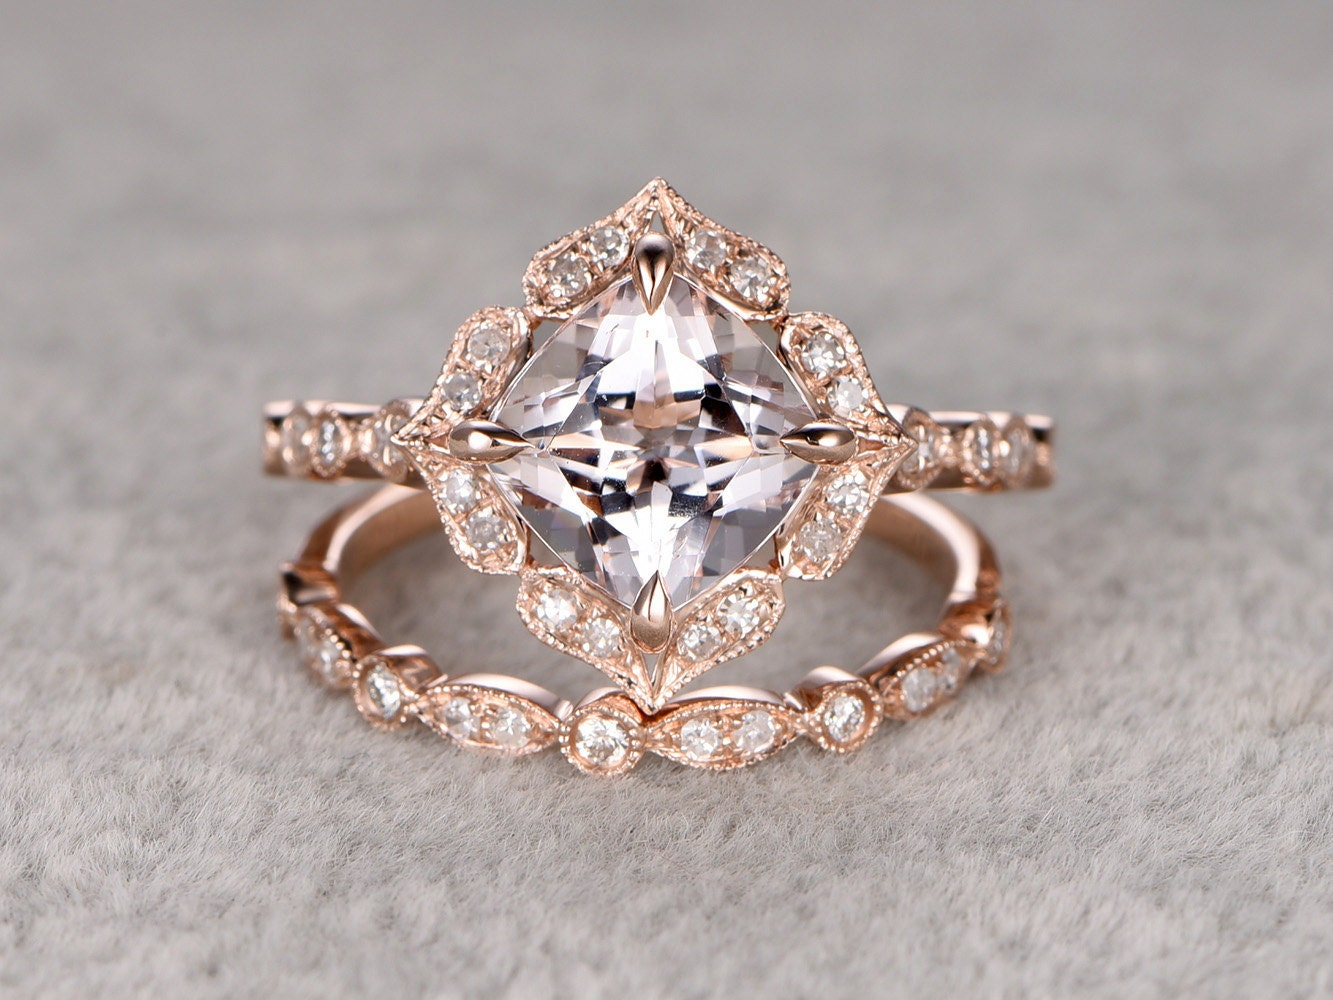 2pcs 8mm morganite bridal ring setart deco engagement ring. Black Bedroom Furniture Sets. Home Design Ideas